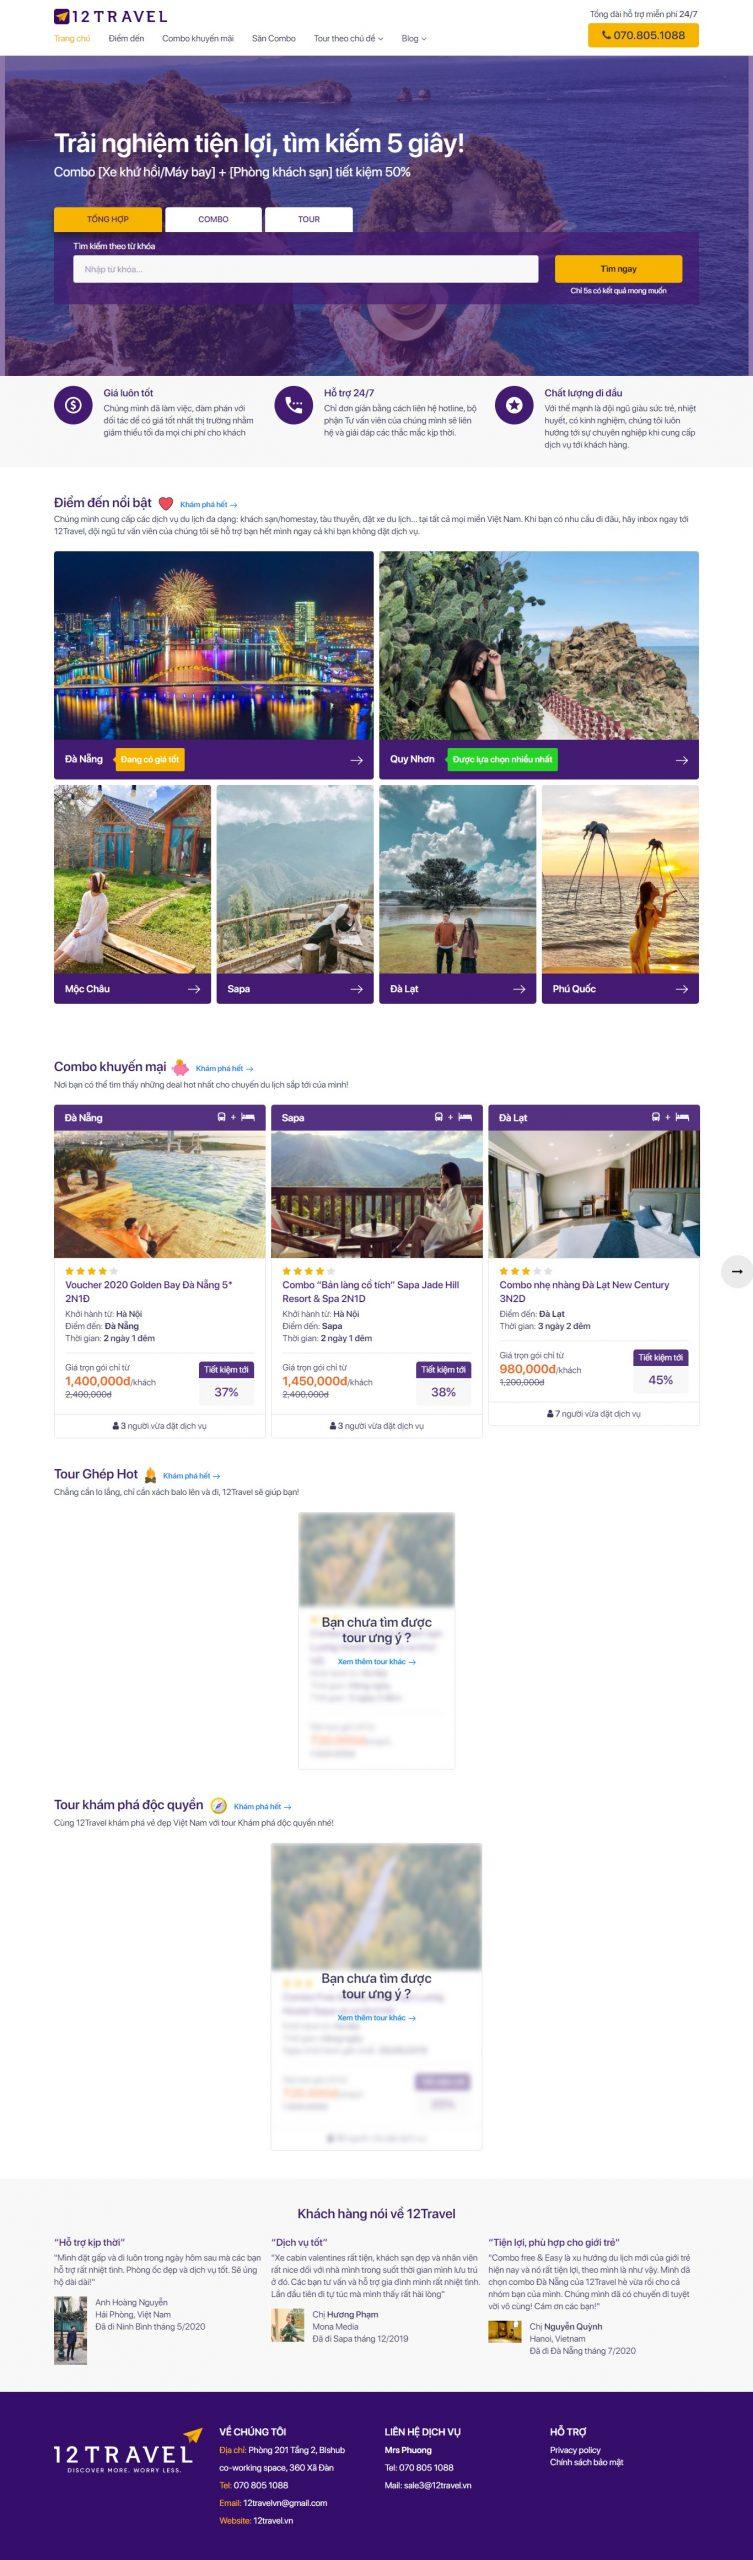 dự án website du lích 12 travel